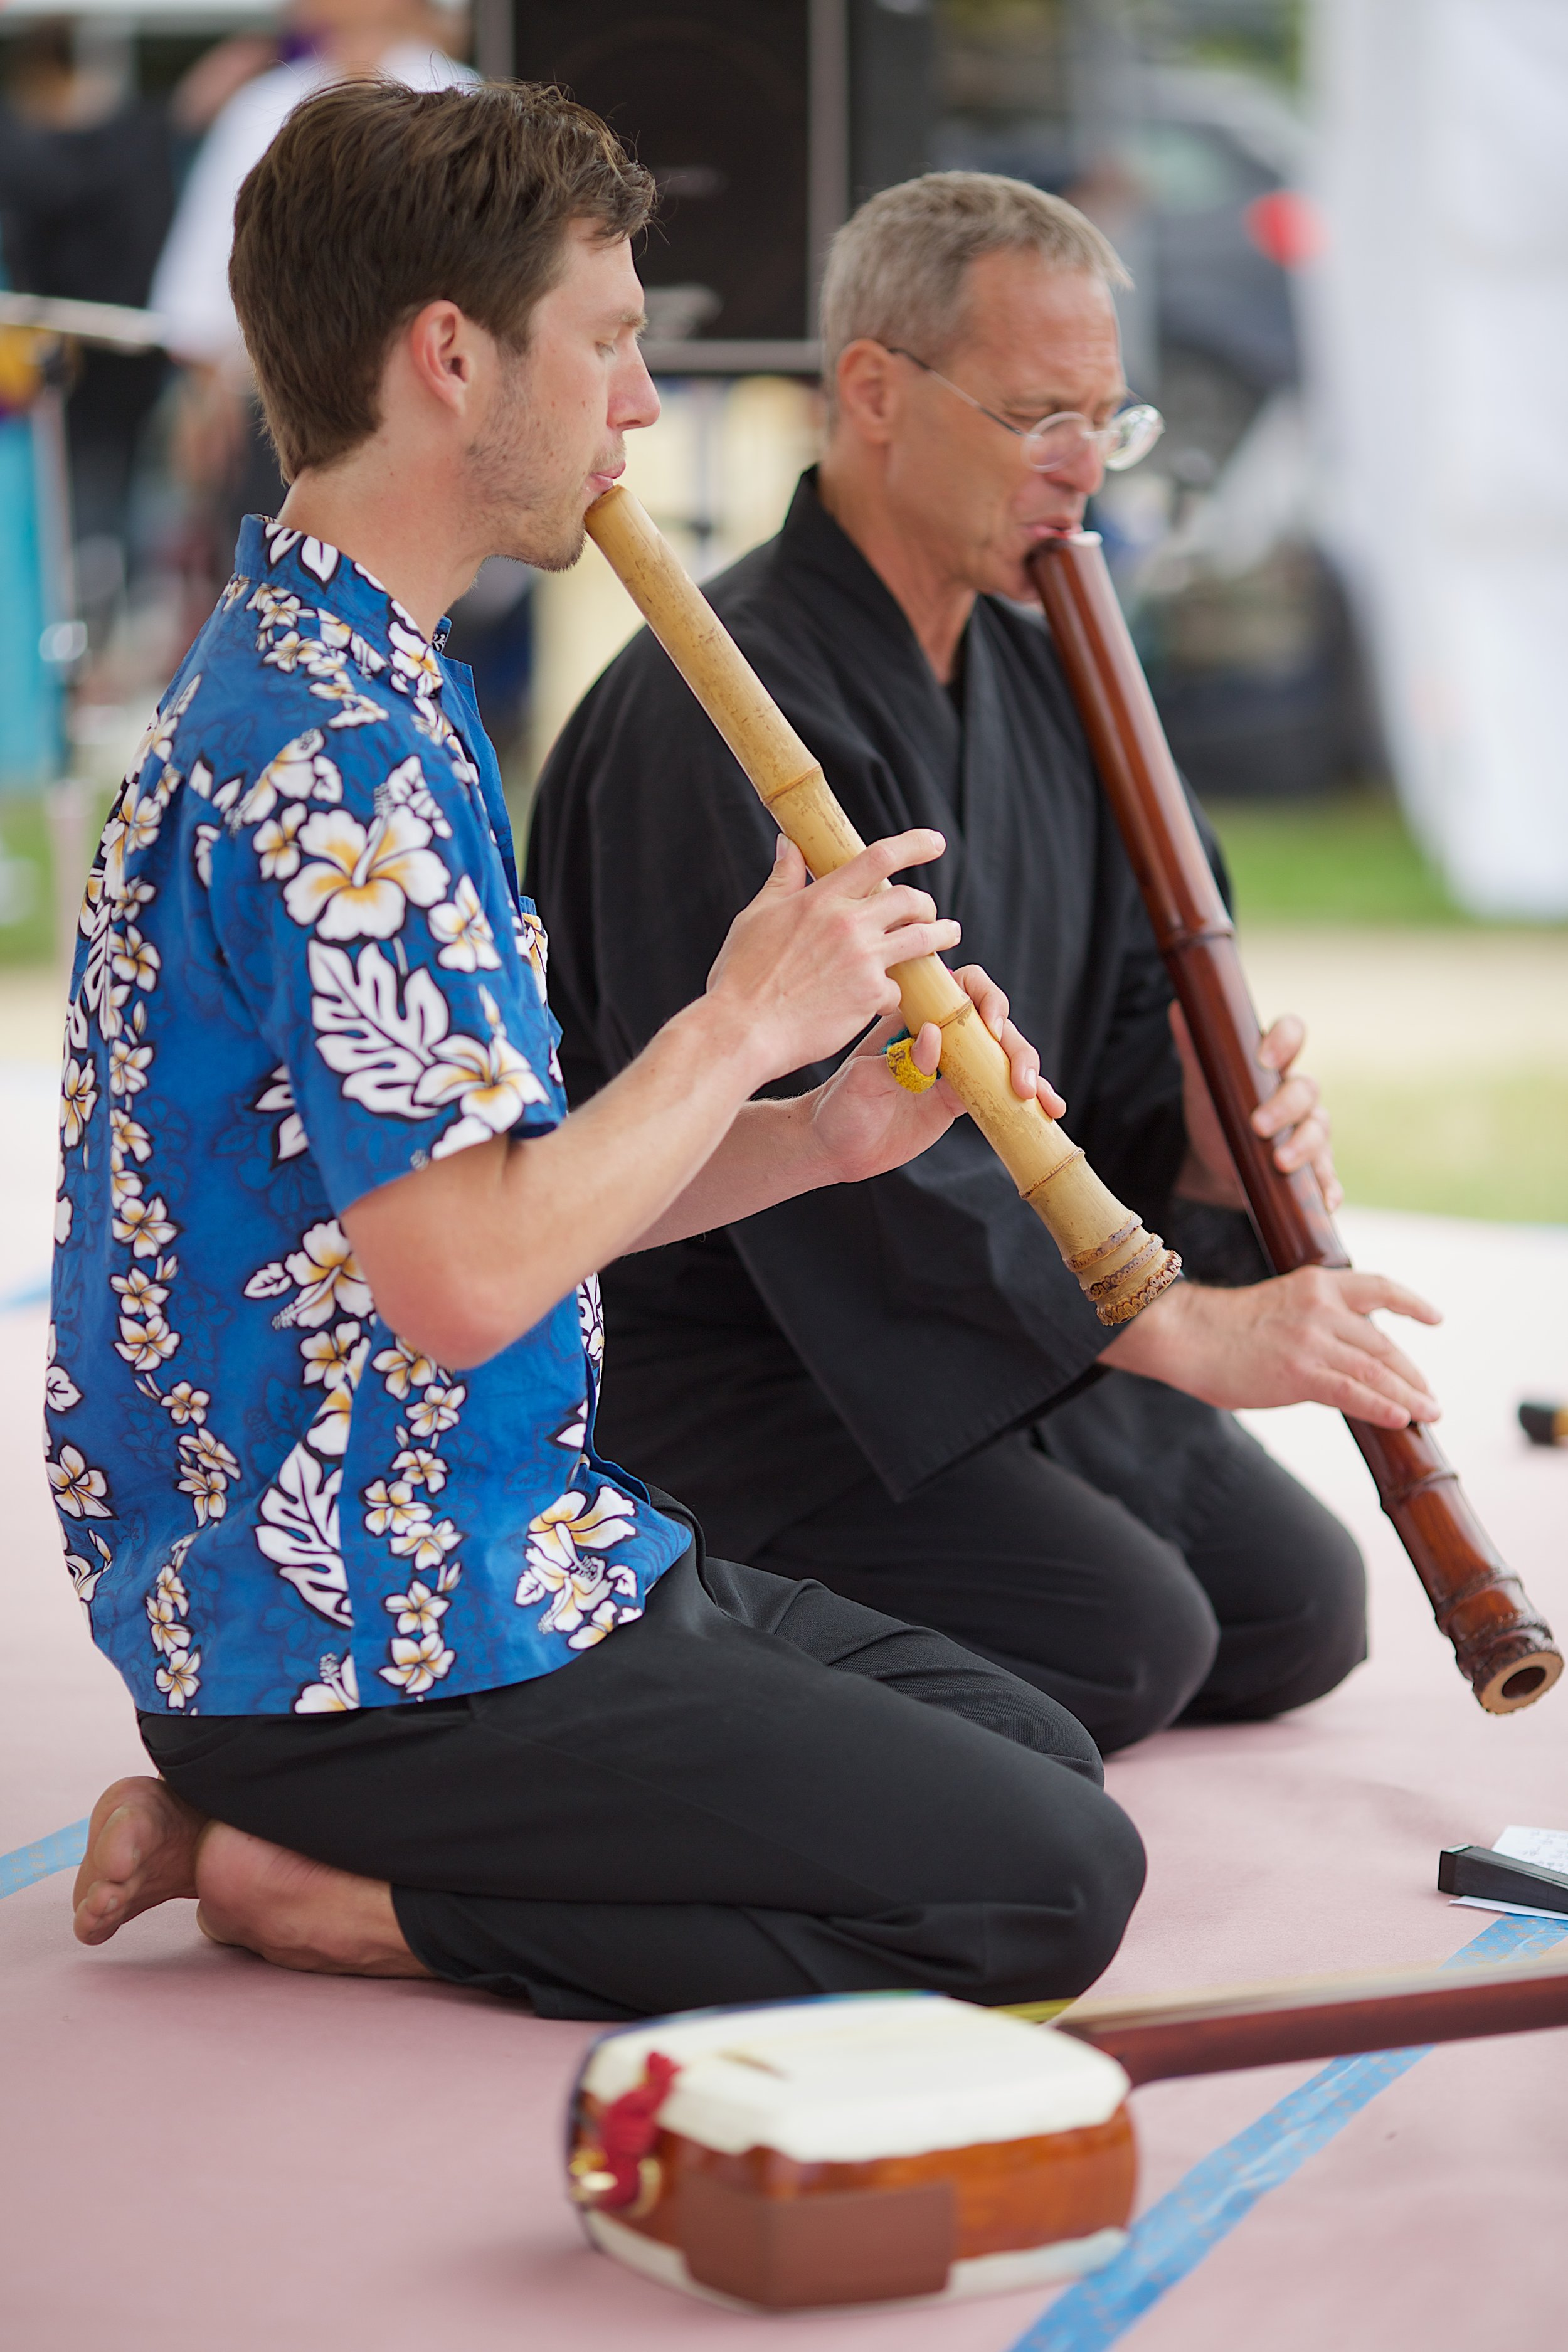 kyle-and-karl---japanese-cultural-fair-of-santa-cruz-2015_19408668568_o.jpg